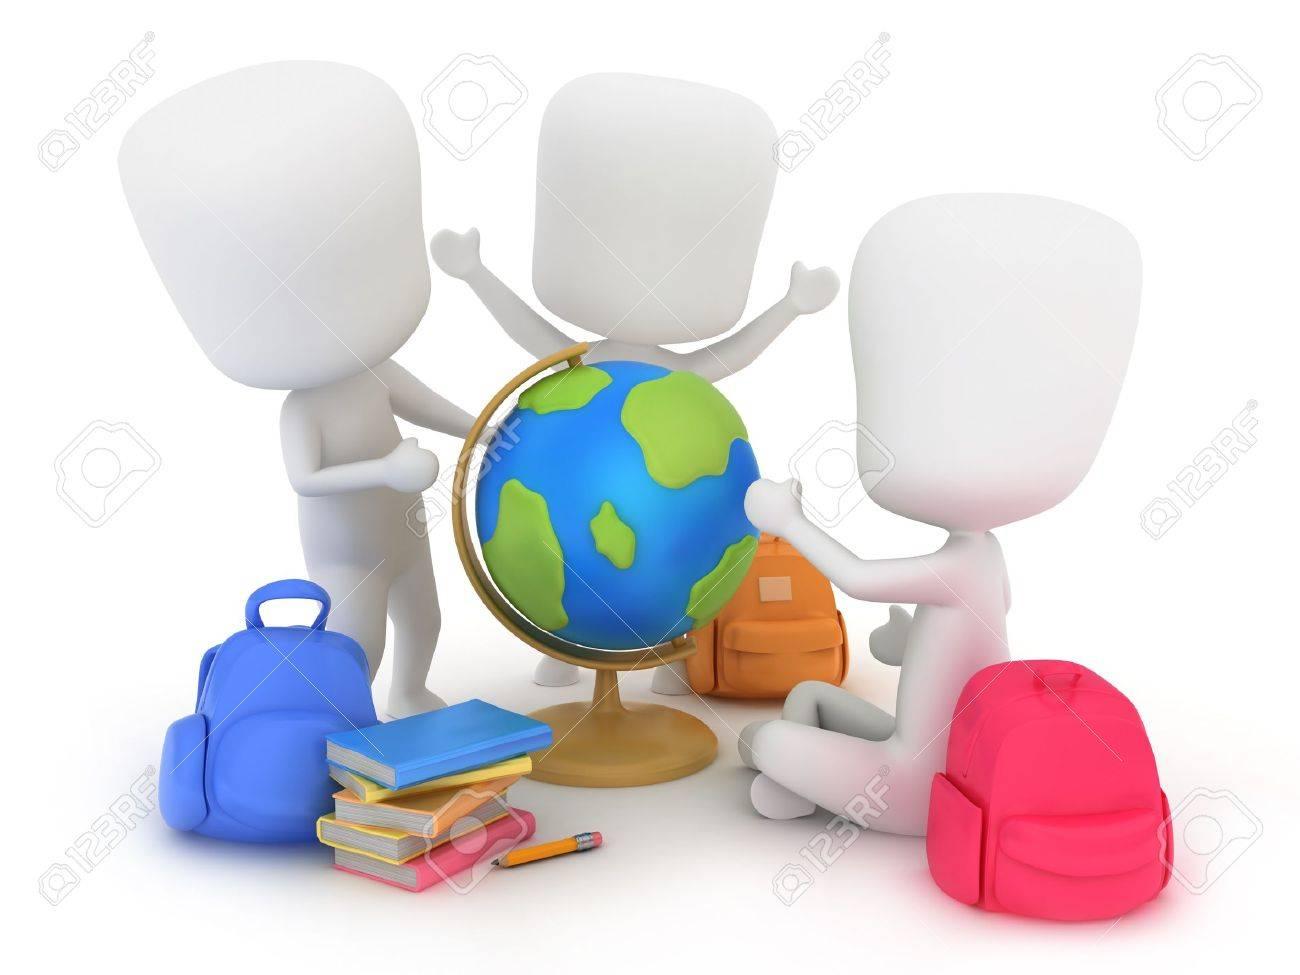 Illustration of Preschool Kids Using a Globe Stock Illustration - 10132541